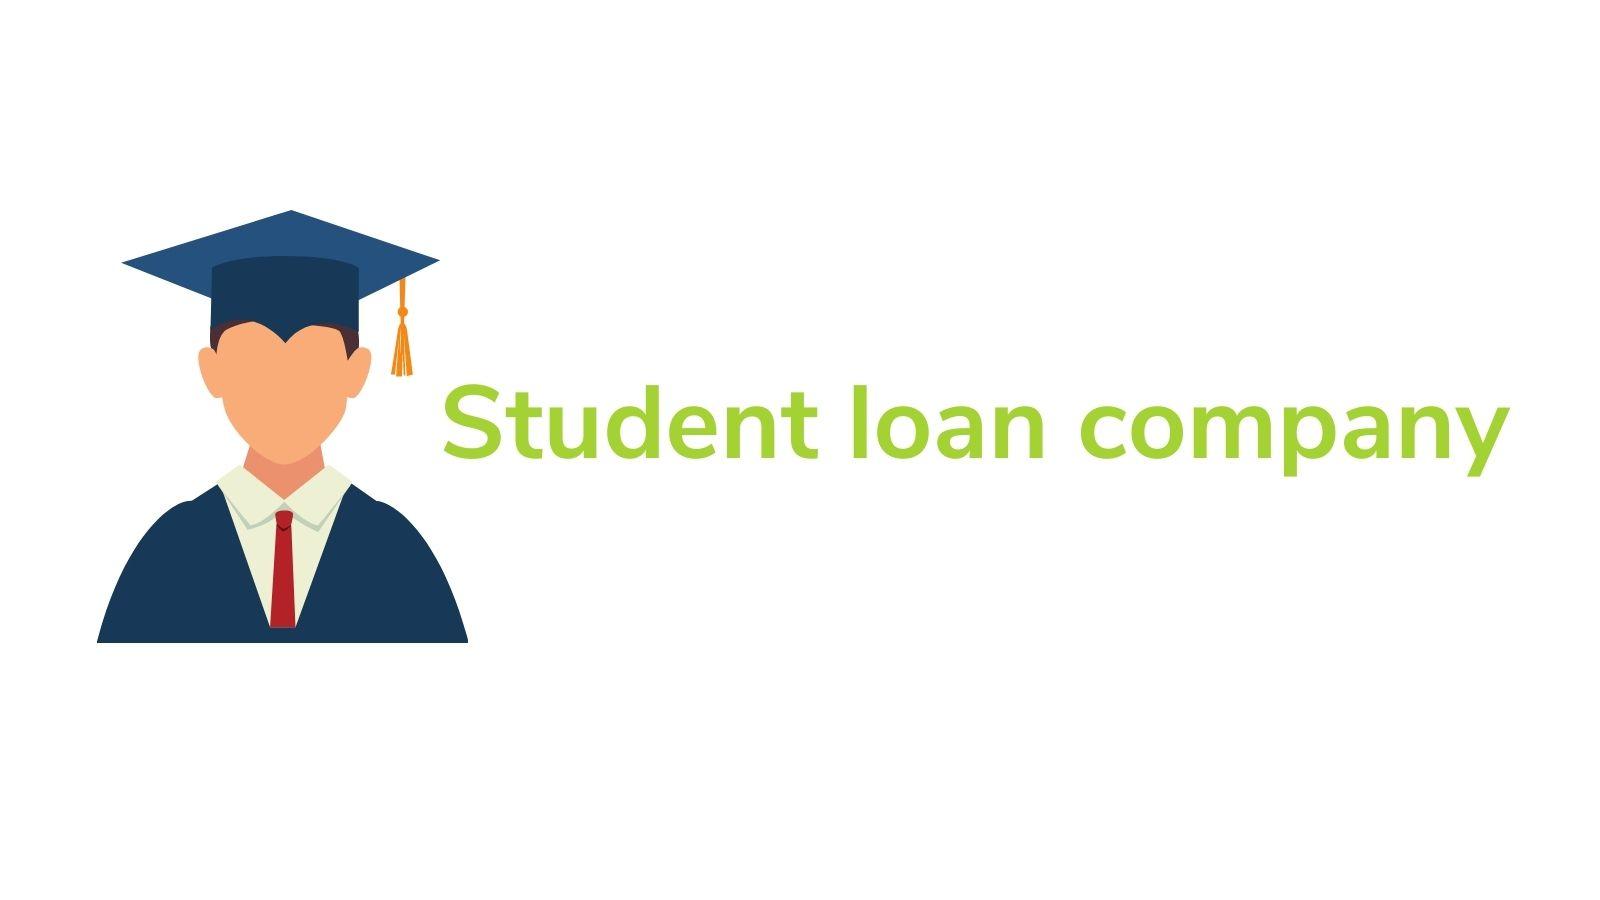 Student loan company image2